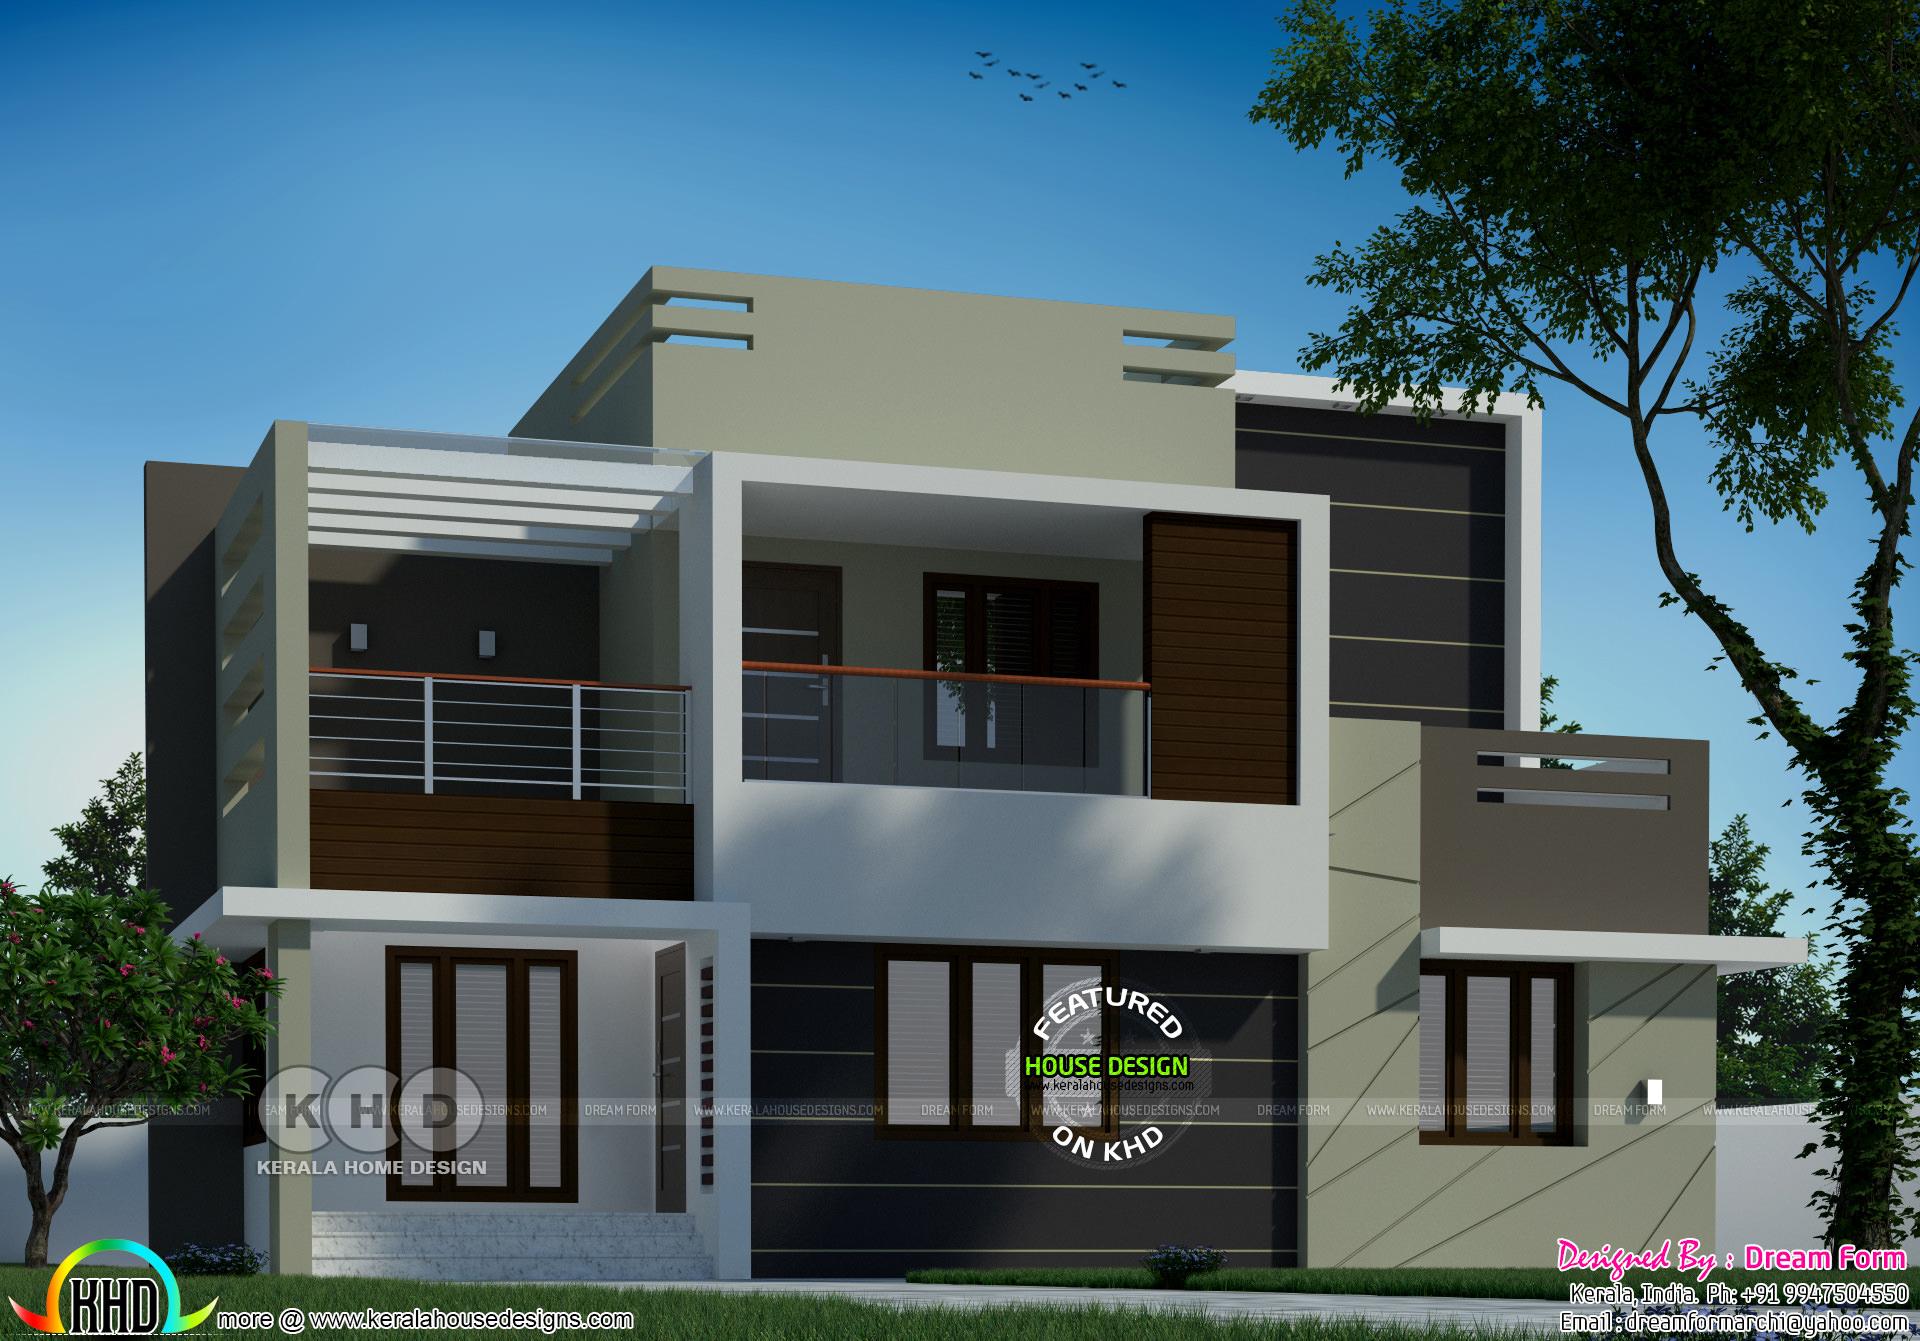 1871 square feet 4 bedroom modern house | Kerala home design ... on 1300 sq ft house plans, 300 sq ft house plans, 540 sq ft house plans, 400 sq ft house plans, 4000 sq ft house plans, 800 sq ft house plans, 100 sq ft house plans, 615 sq ft house plans, 110 sq ft house plans, 1000 sq ft house plans, 200 sq ft house plans, 930 sq ft house plans, 1150 sq ft house plans, 720 sq ft house plans, 5,000 sq ft house plans, 850 sq ft house plans, 10000 sq ft house plans, 30000 sq ft house plans, 600 sq ft house plans, 500 sq ft house plans,